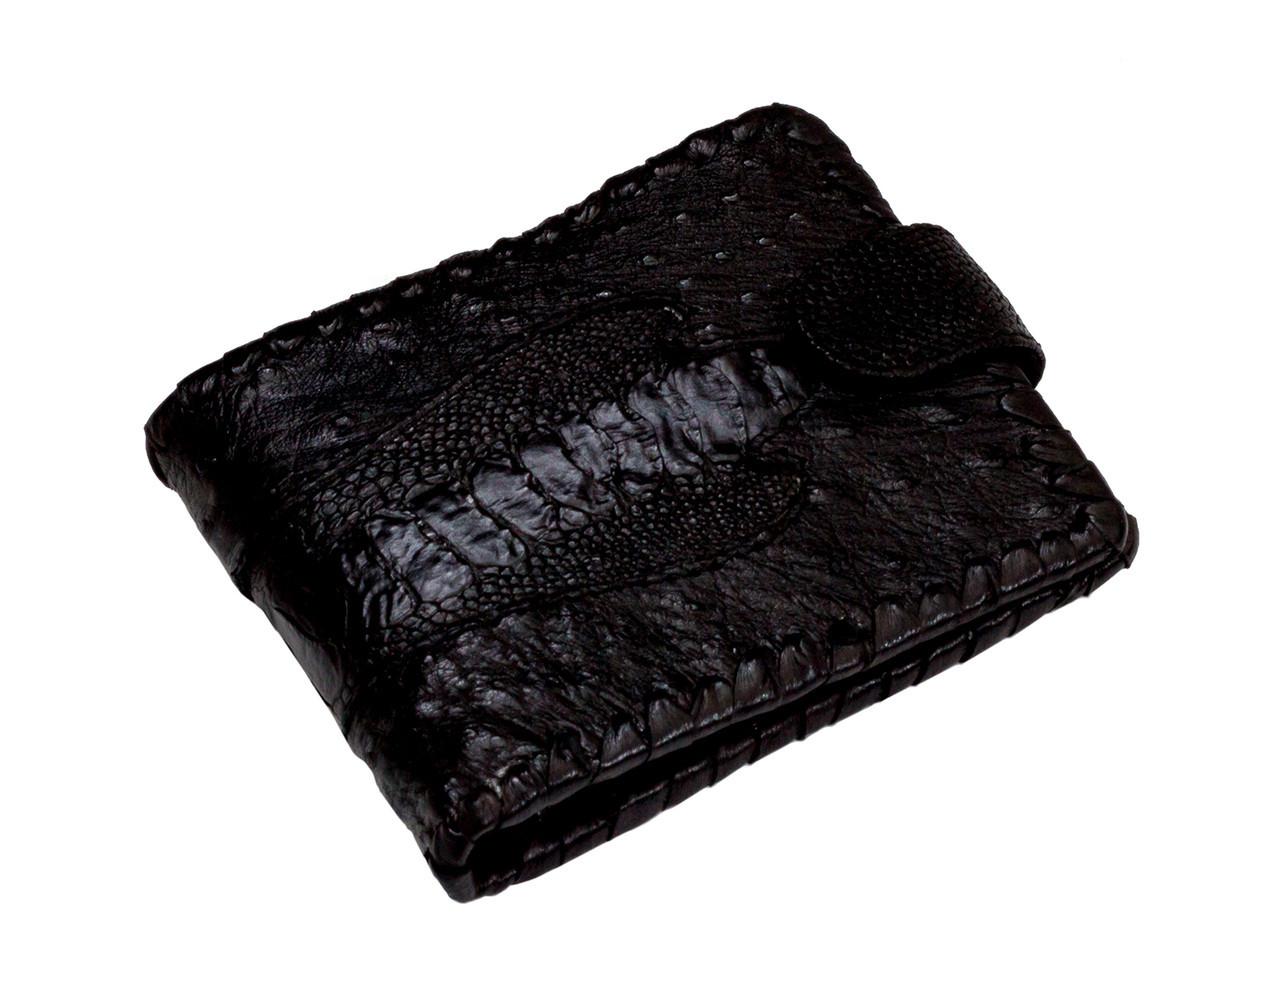 Портмоне из кожи страуса  Ekzotic leather Черное (ow05), фото 1